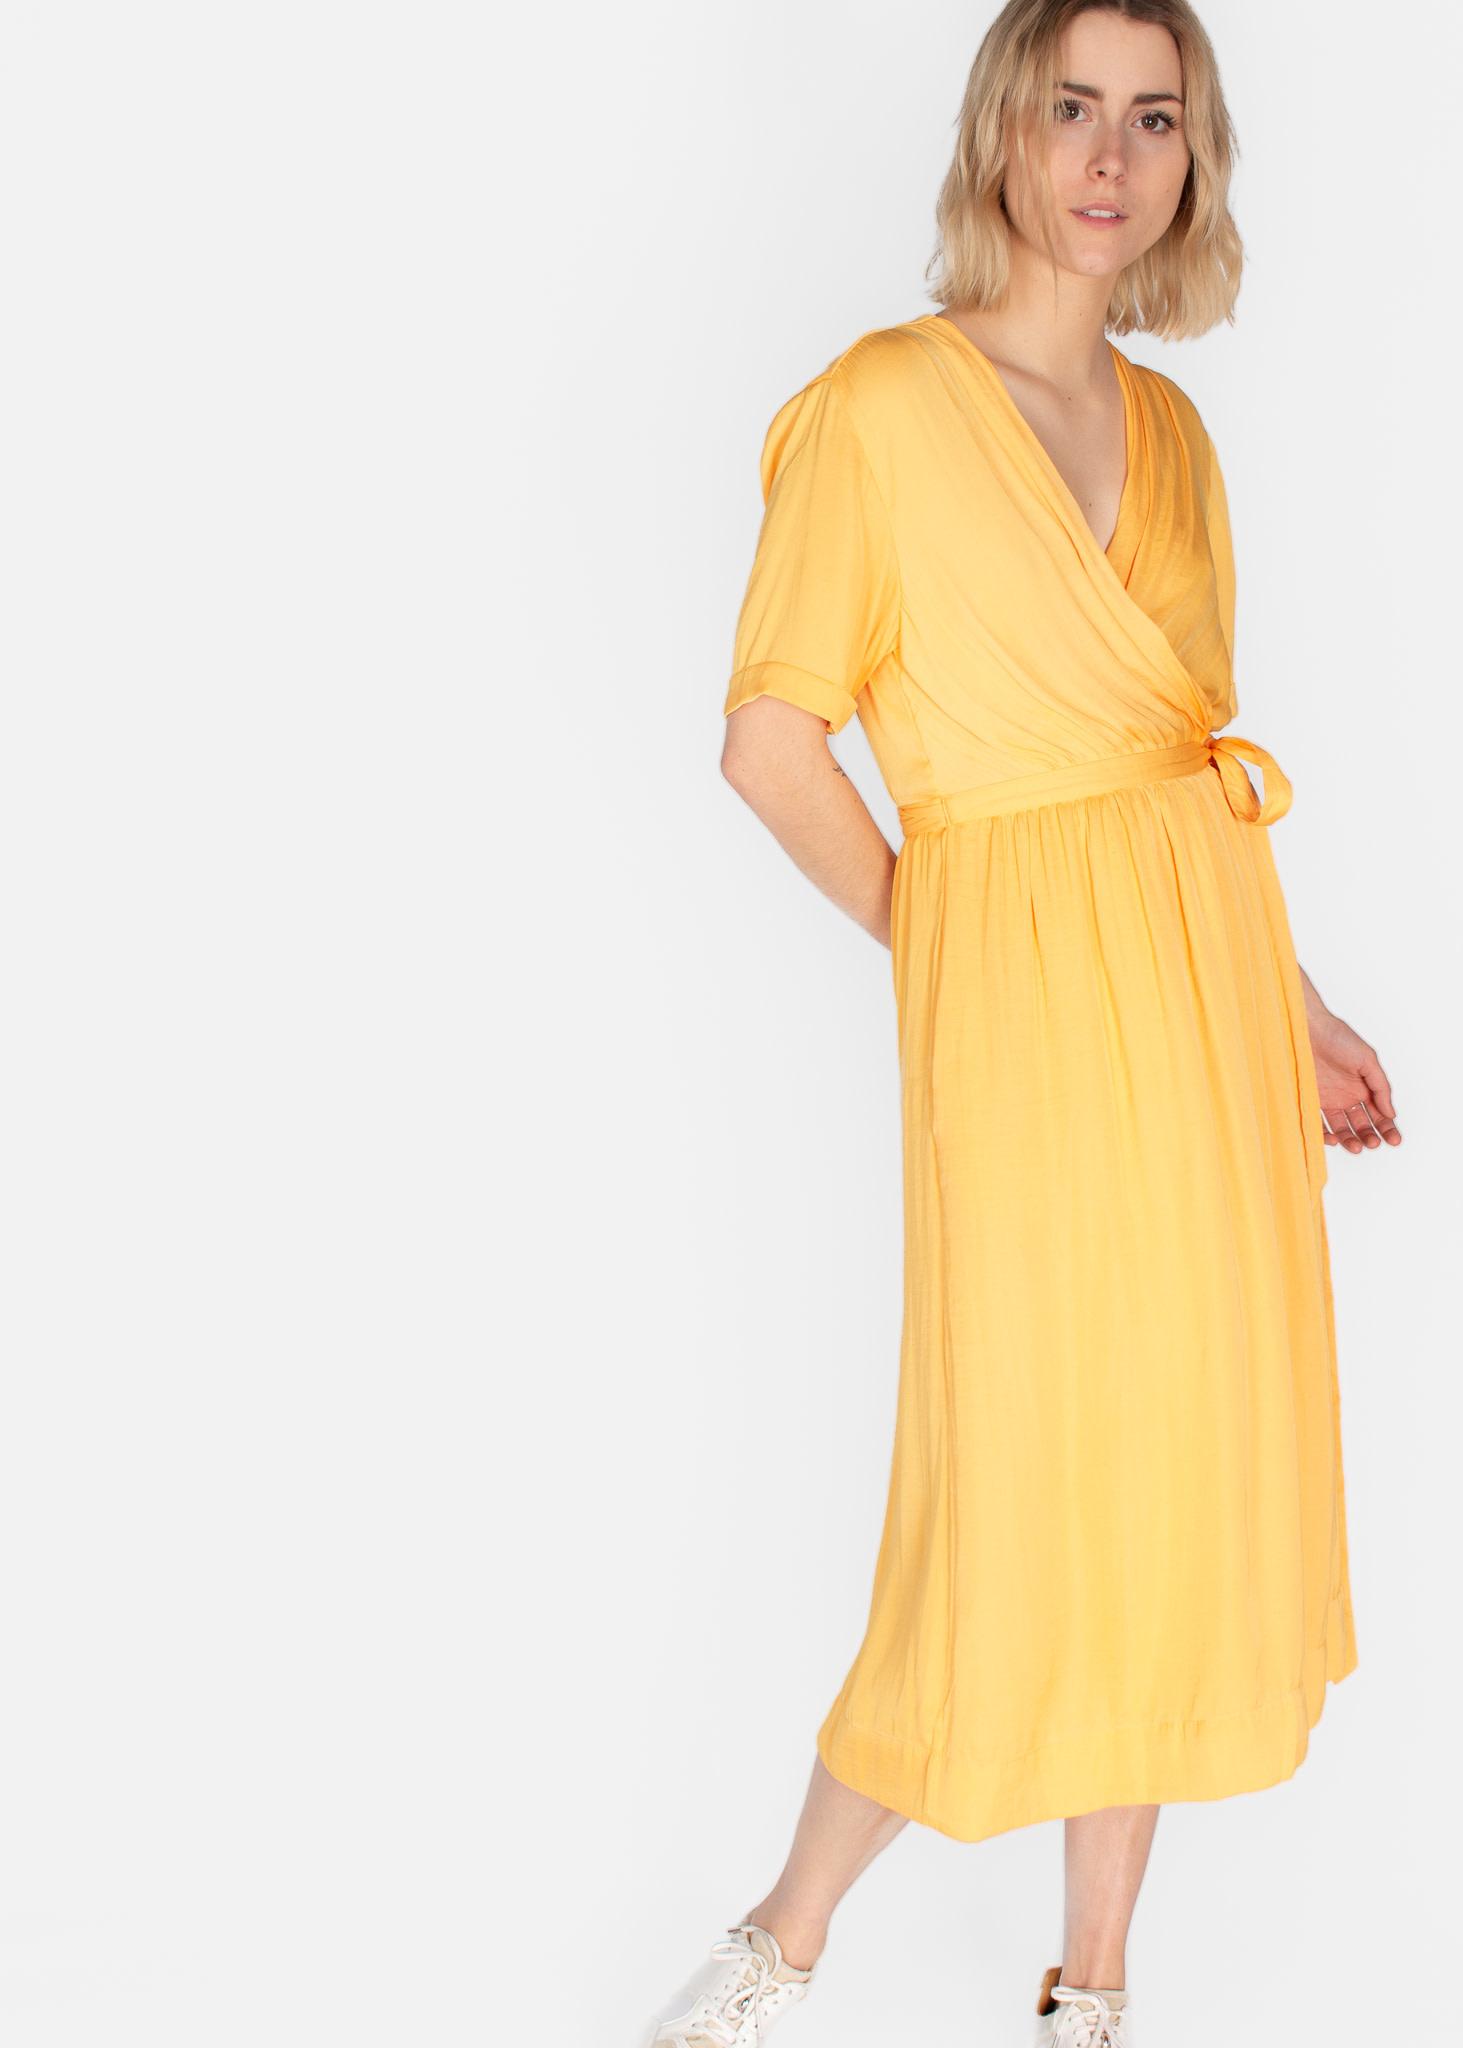 SCOTCH & SODA MIDI LENGTH WRAPOVER DRESS